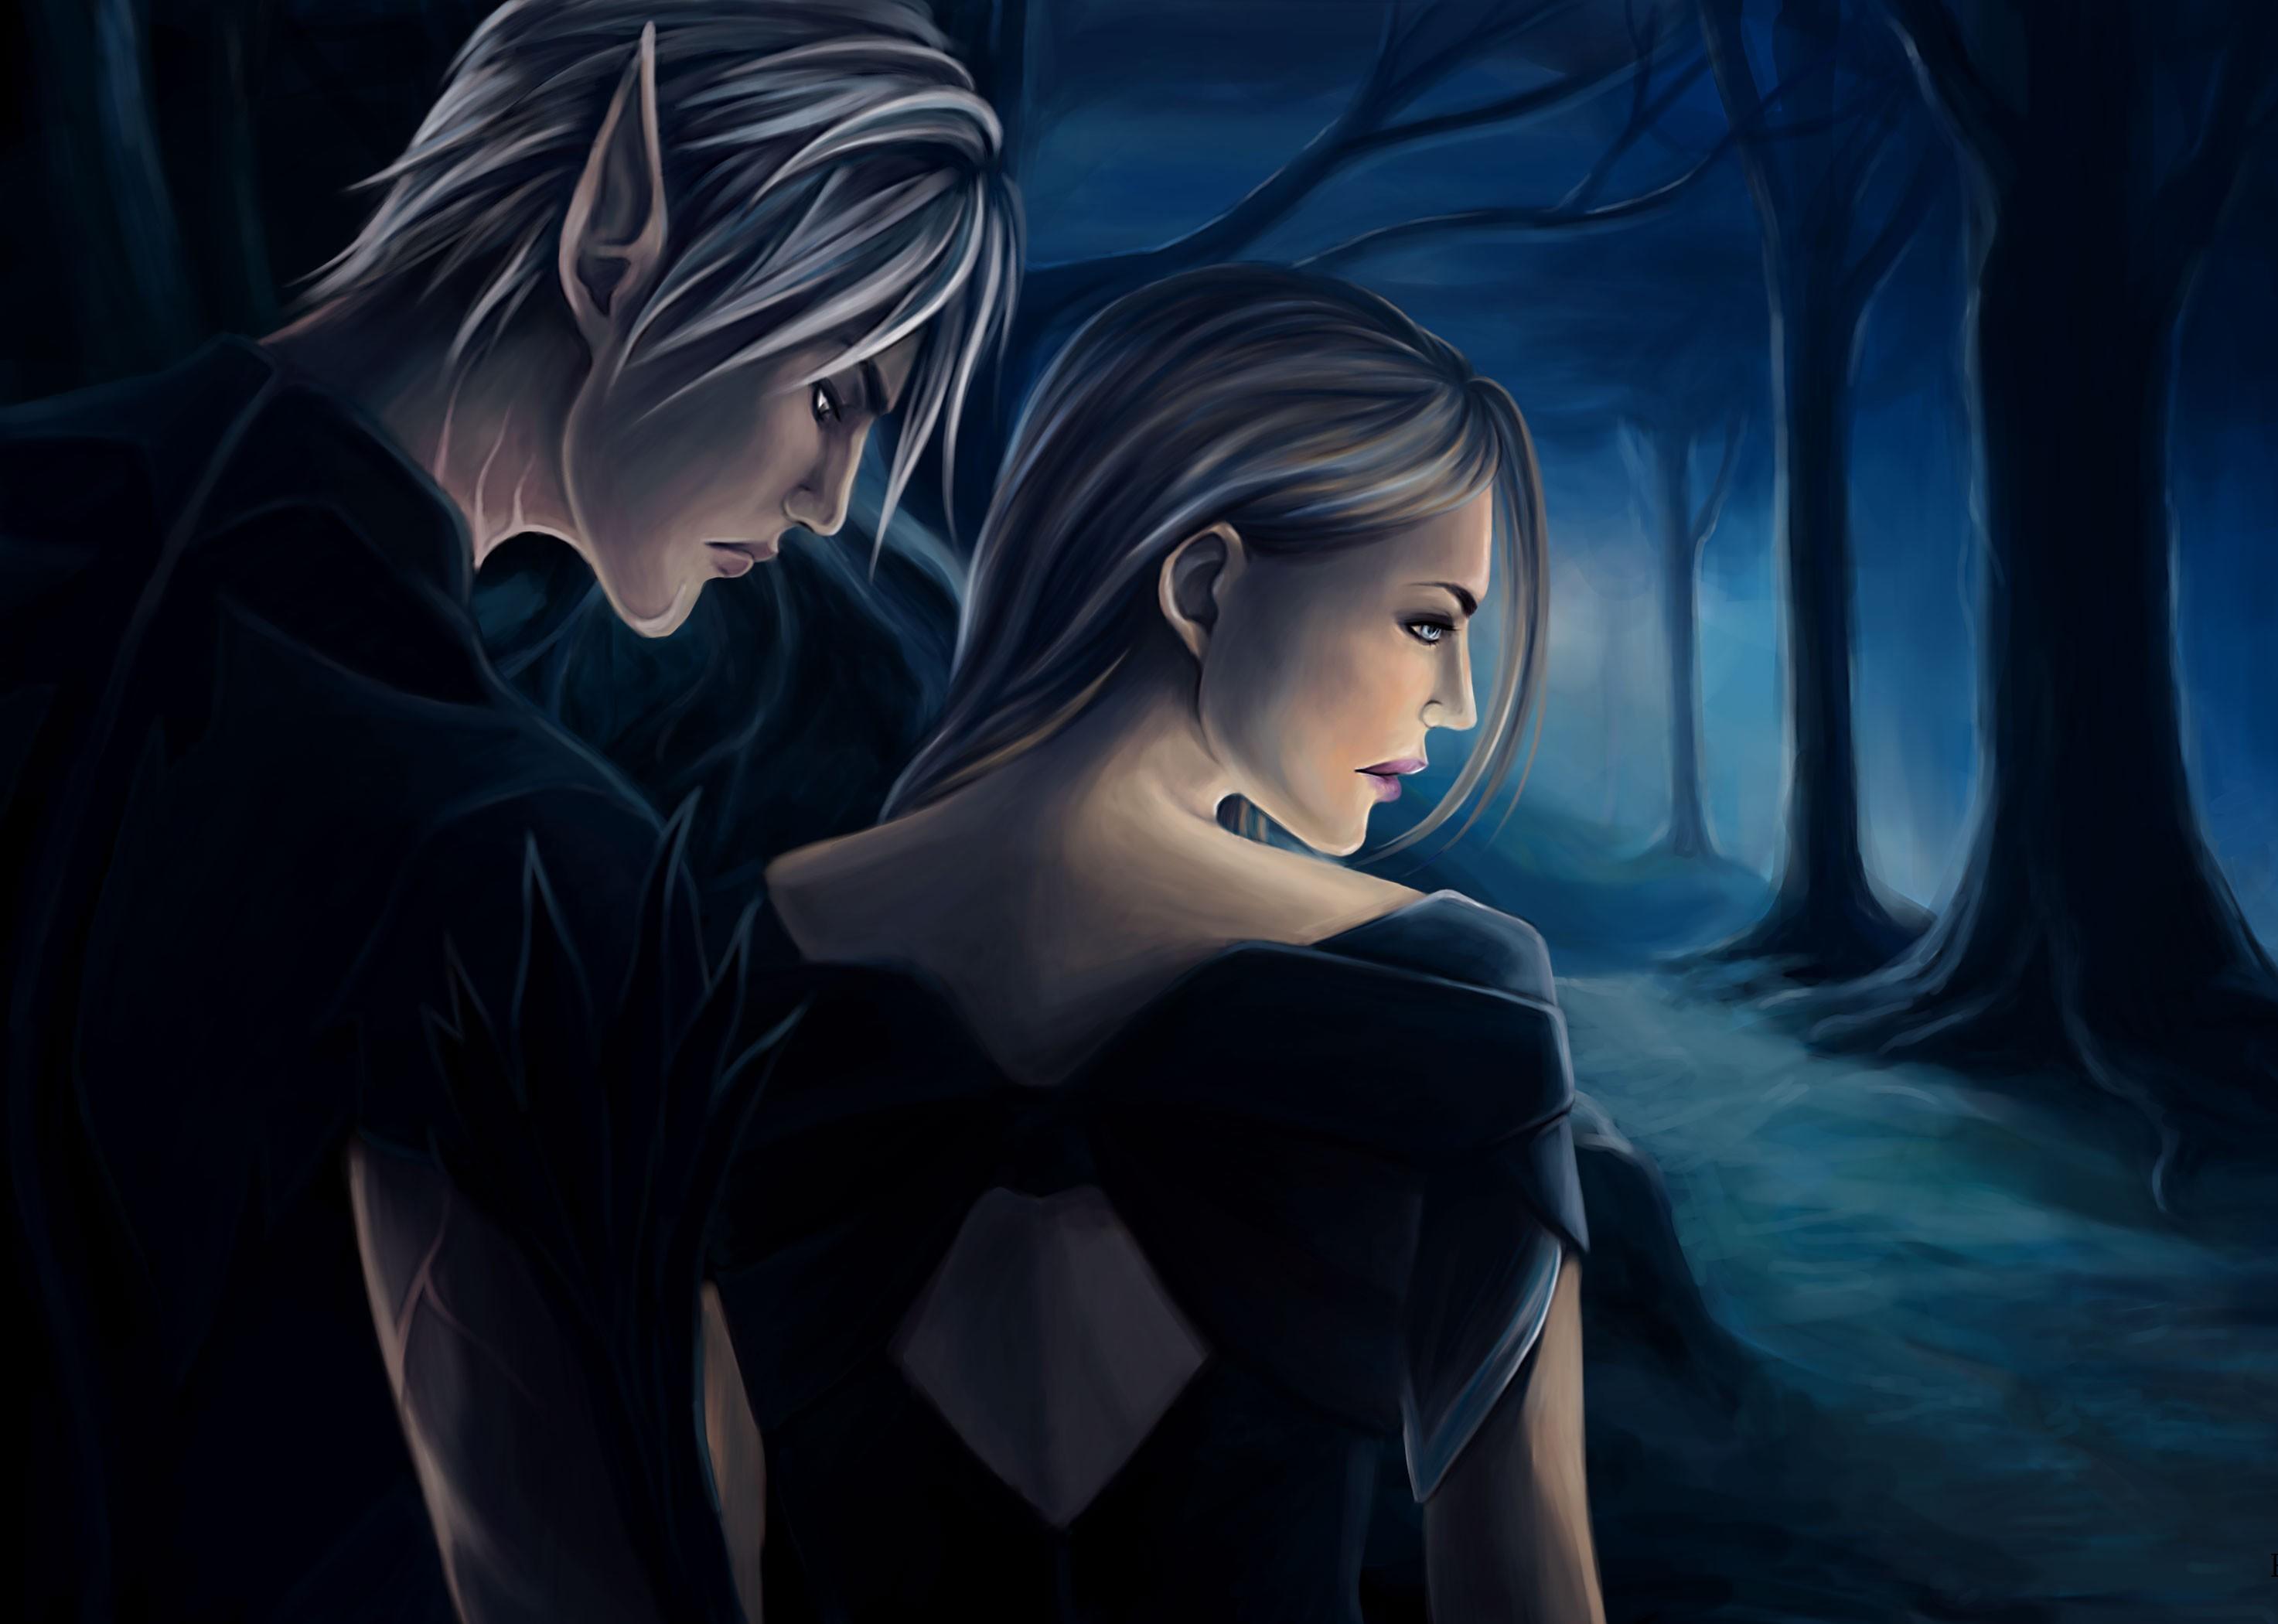 Wallpaper Illustration Anime Dragon Age Midnight Hawke